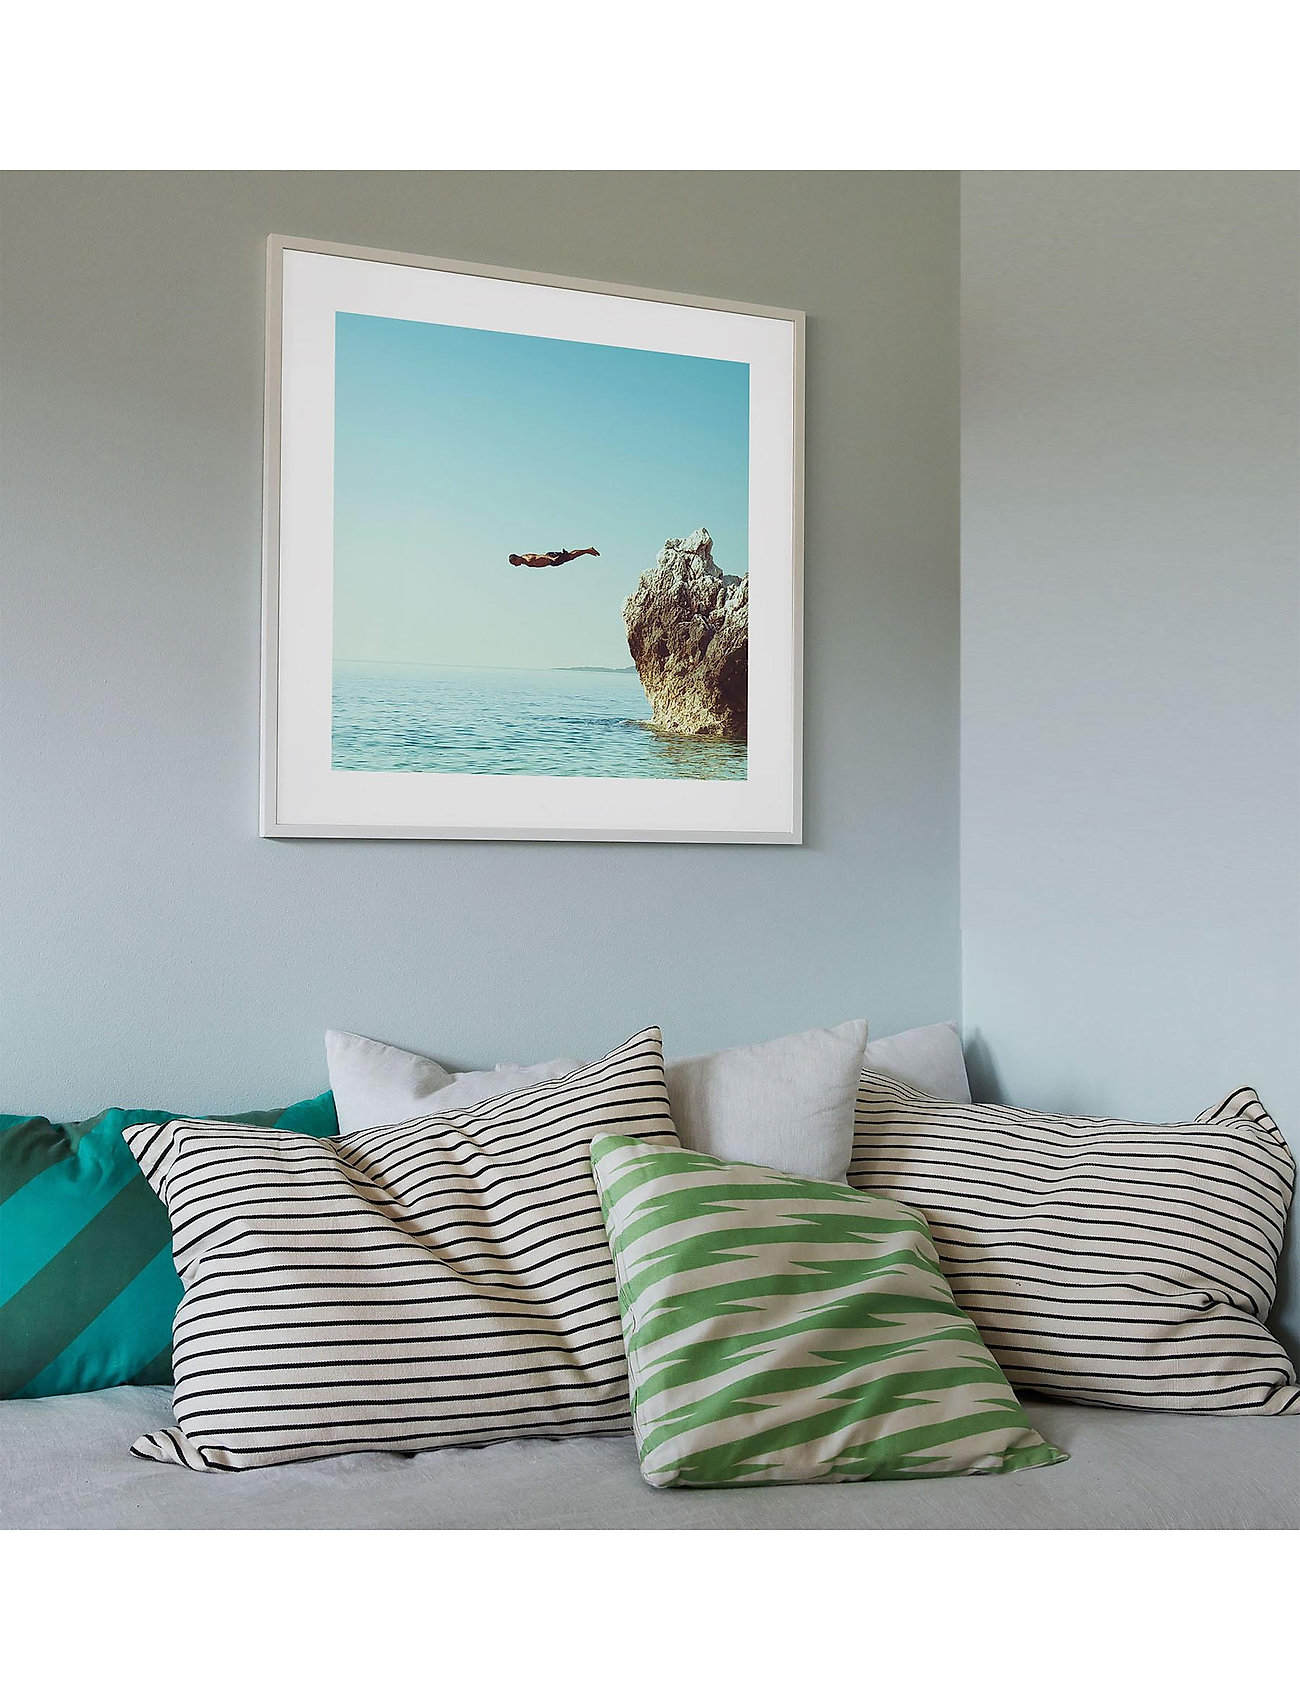 Democratic Gallery - Poster Cliff Dive - home decor - blue - 1